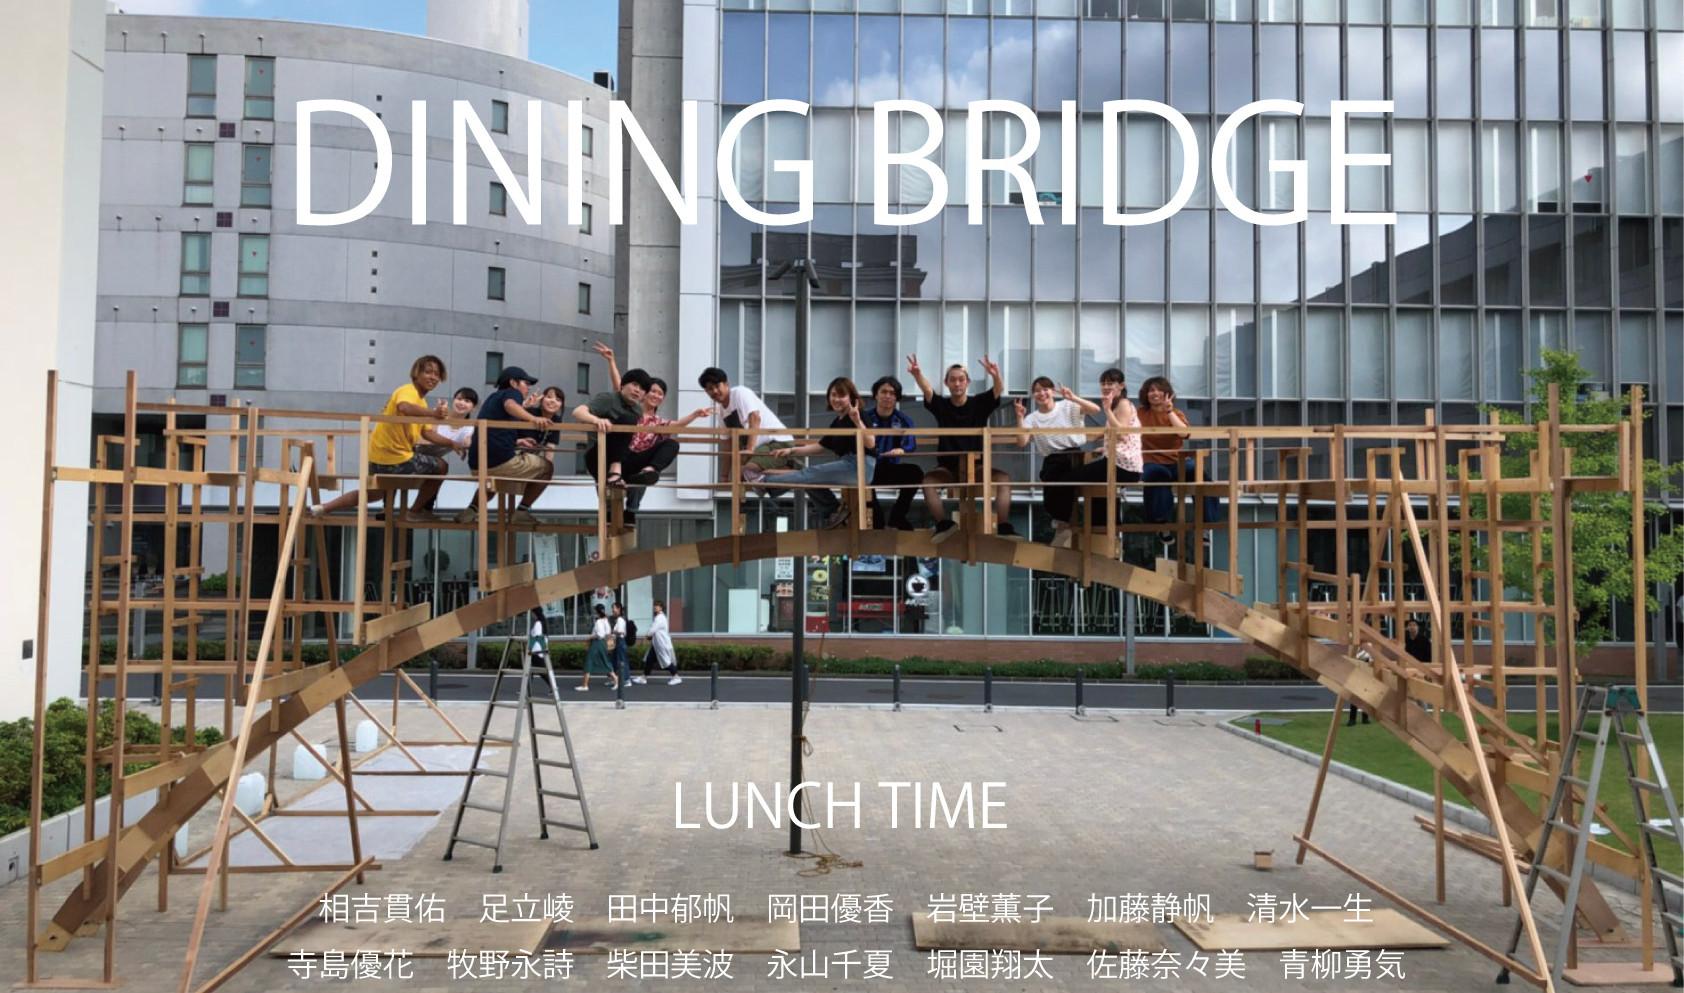 lunchtime_01.jpg